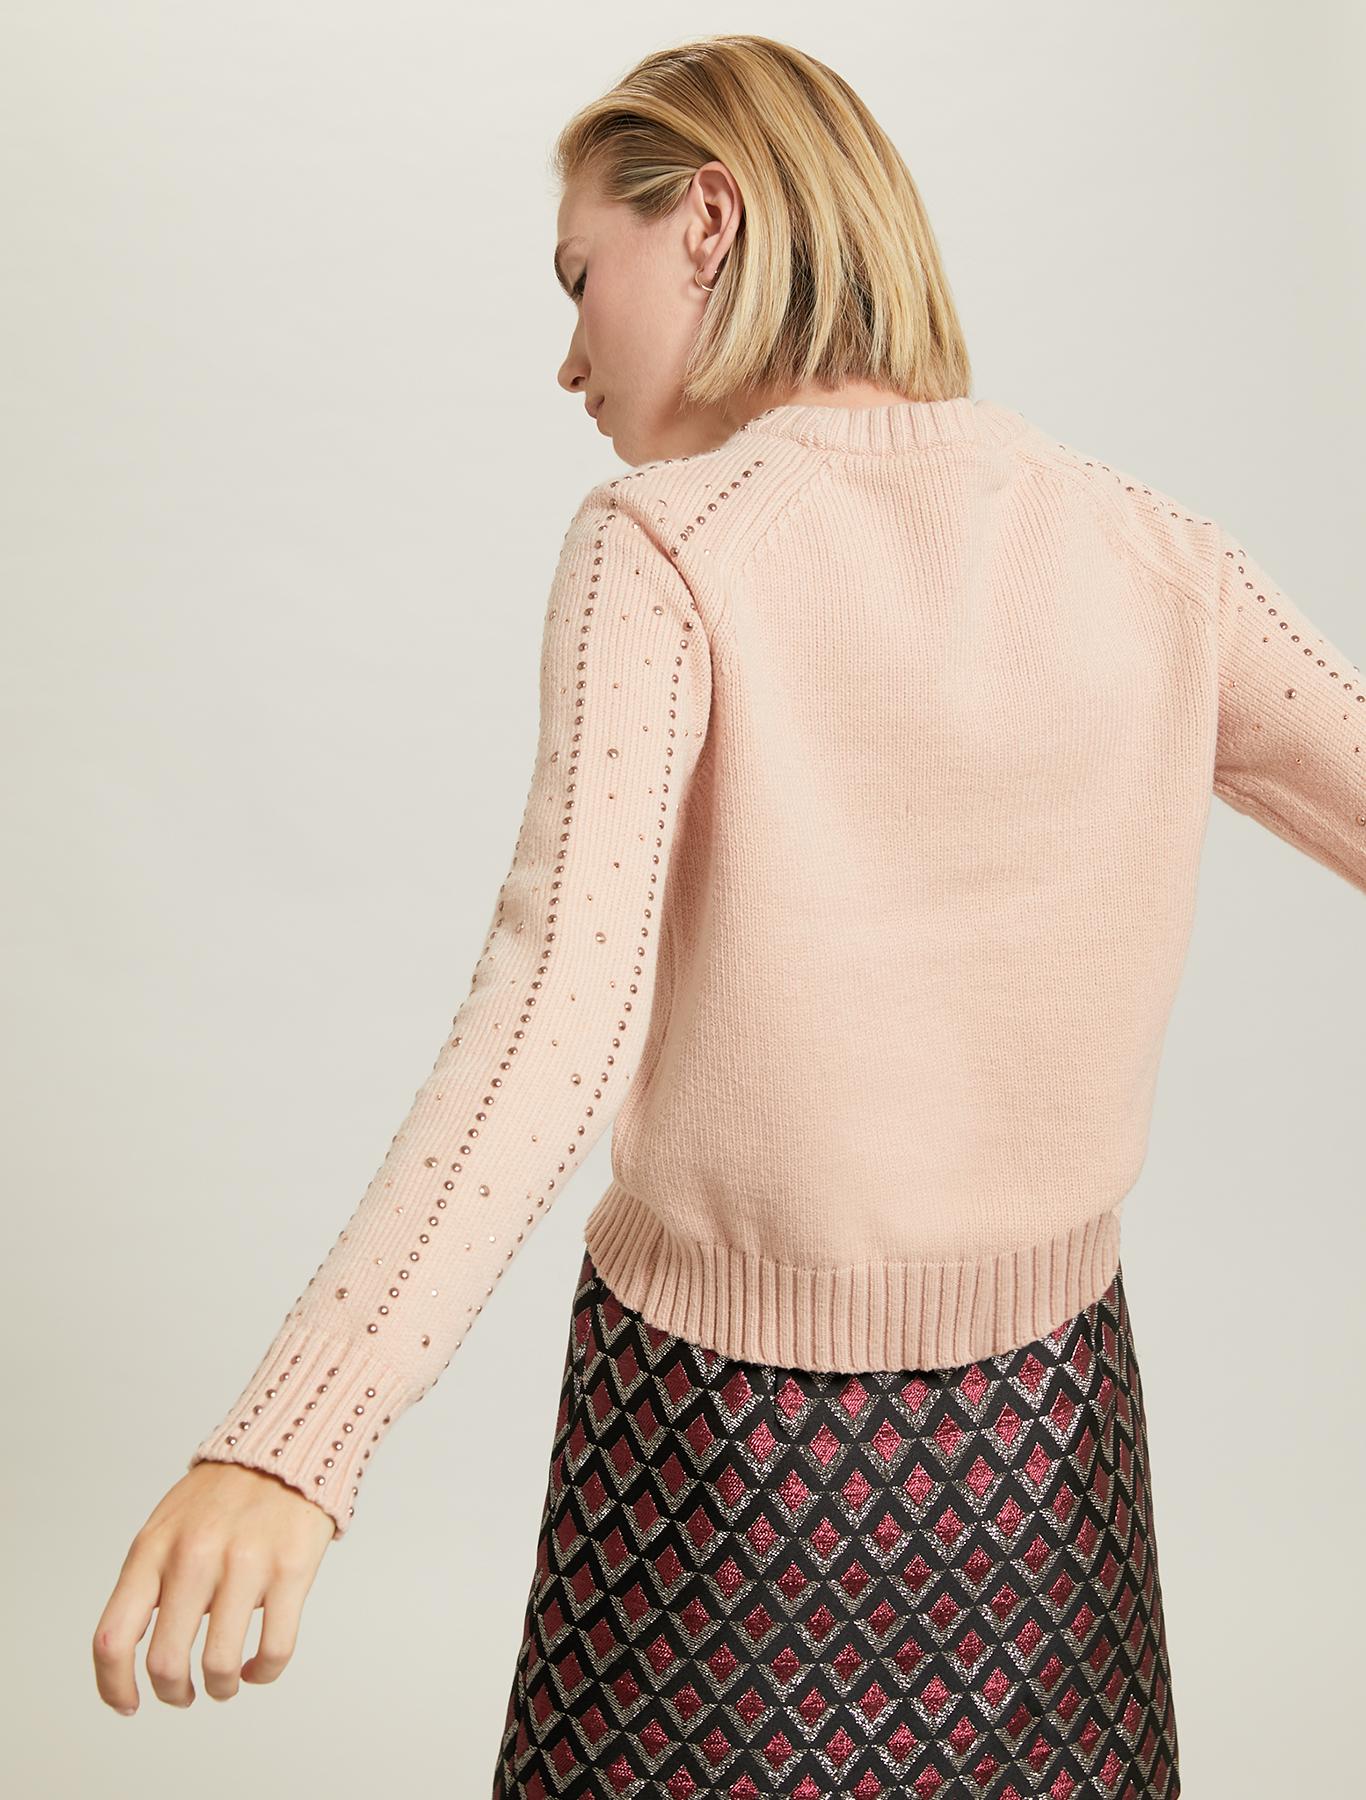 Studded, rhinestone jumper - pink - pennyblack